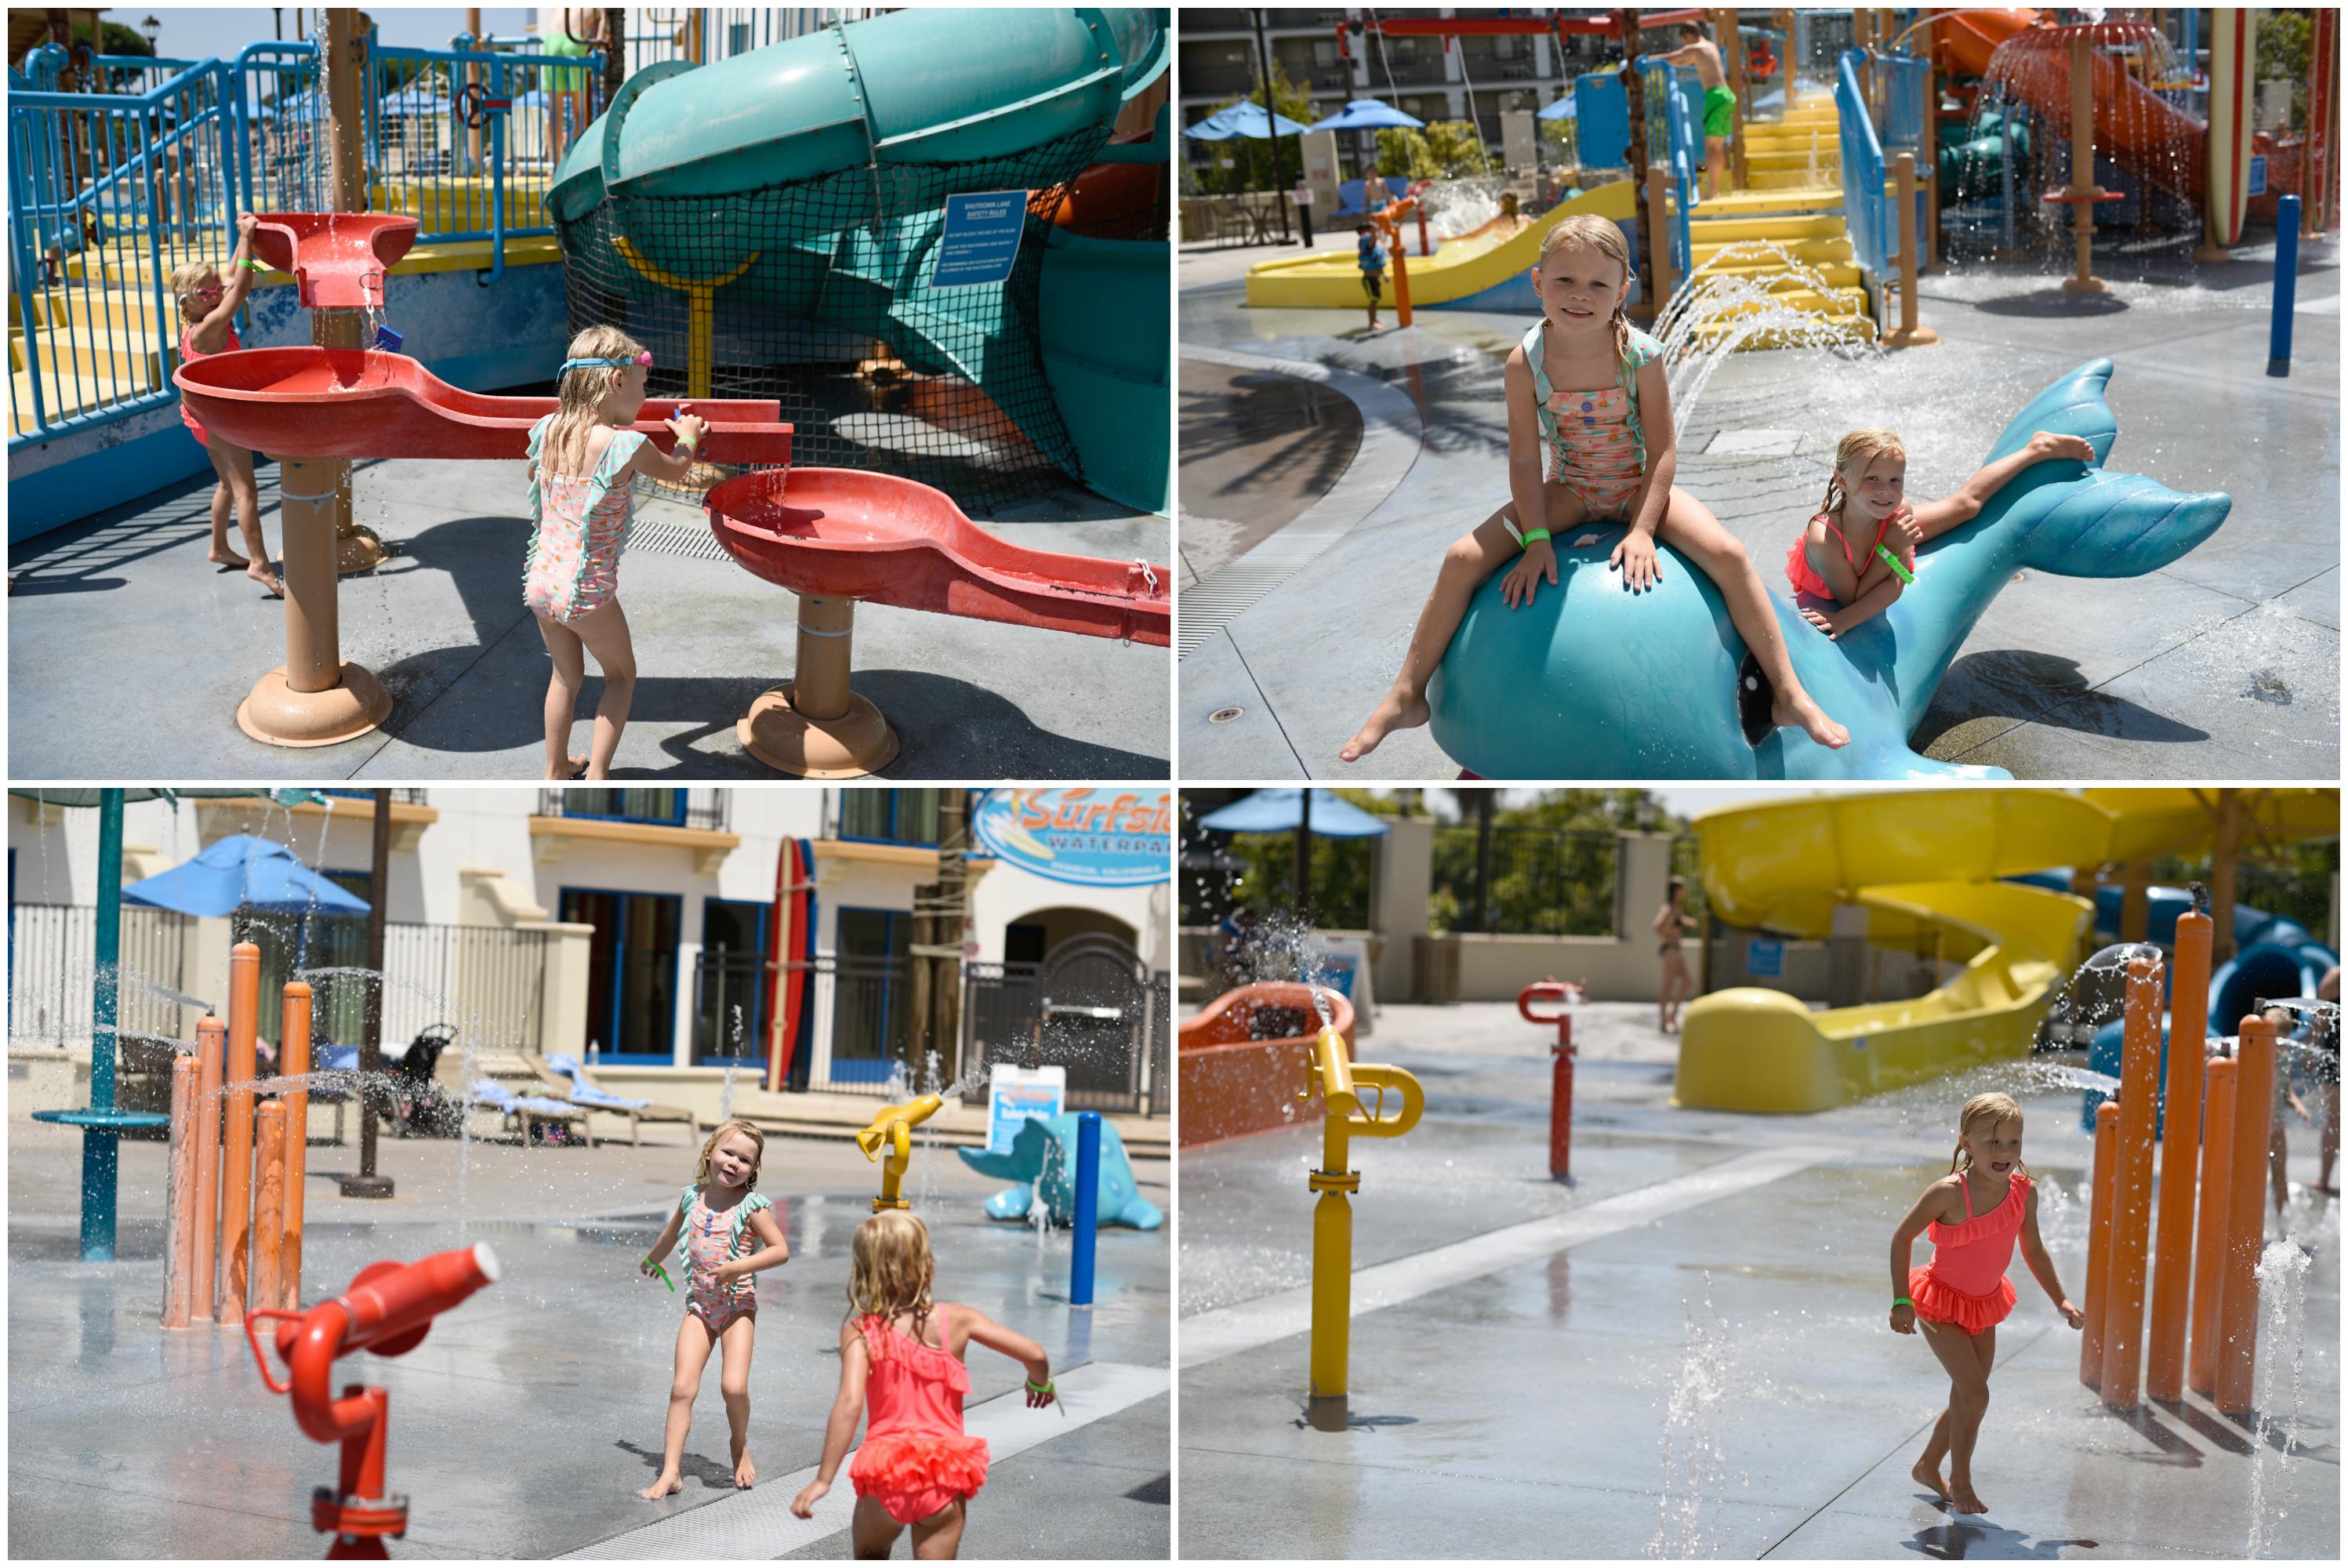 Waterpark9